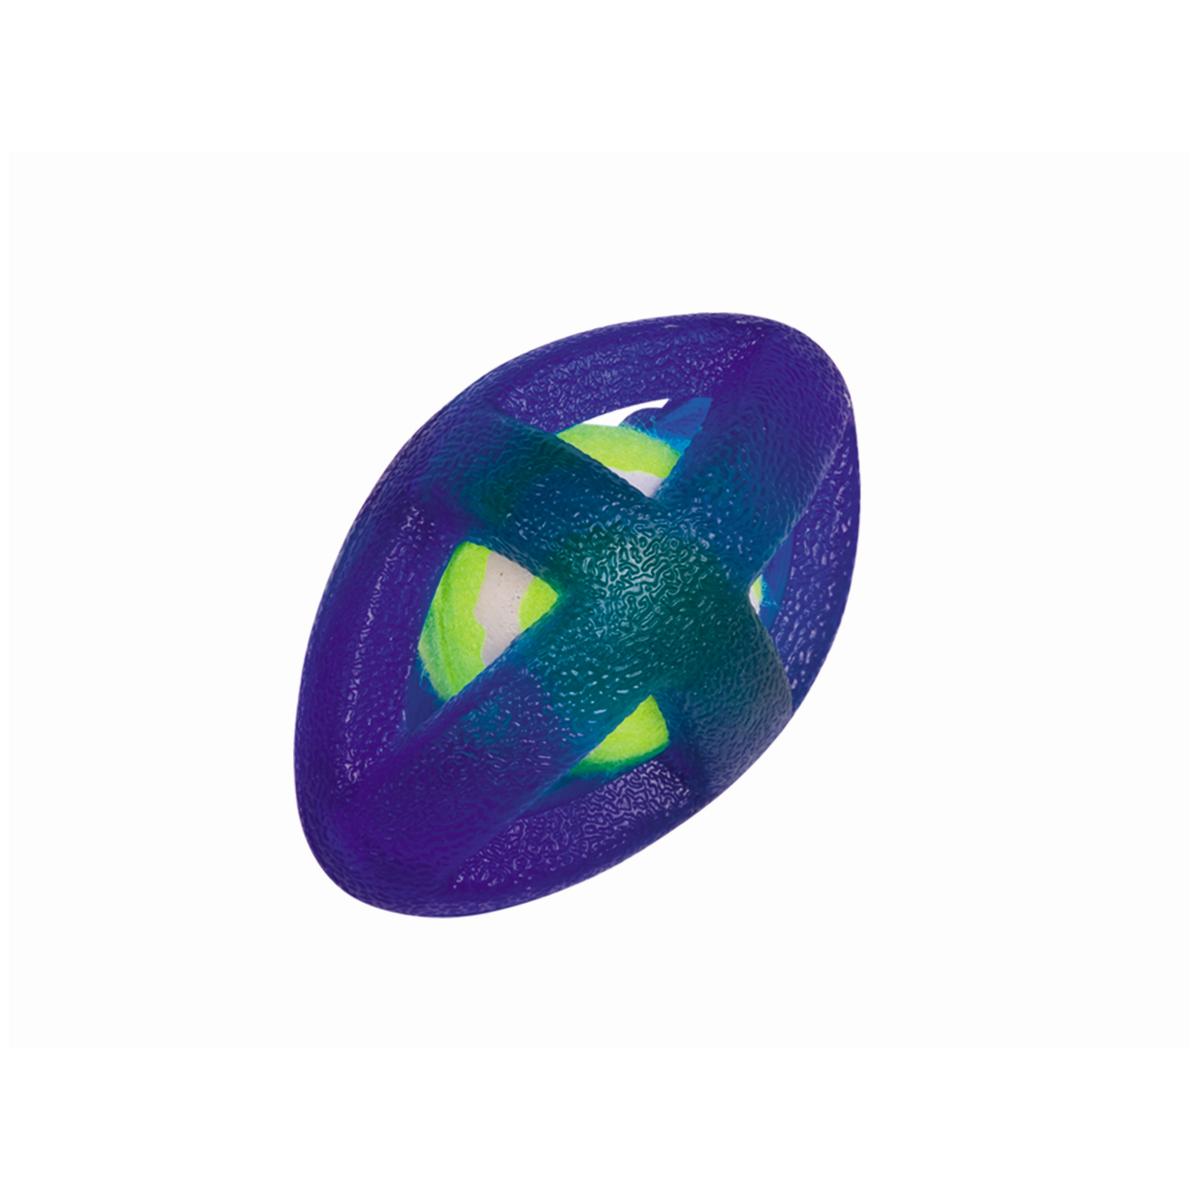 Tpr rugby bal met tennisbal blauw